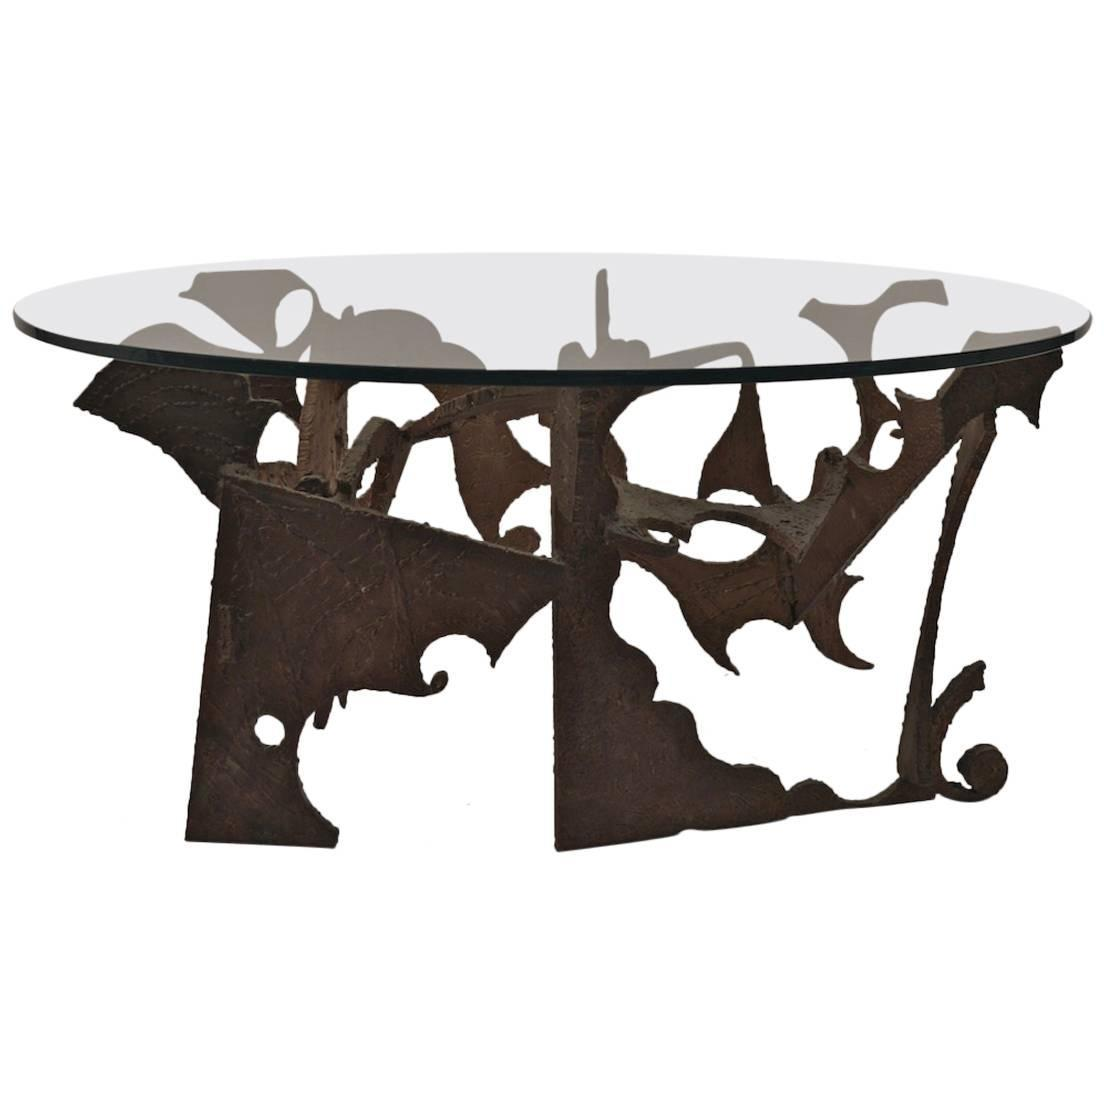 Log Cabin Coffee Tables Using Indoor Vine Plants Also Decorative Art